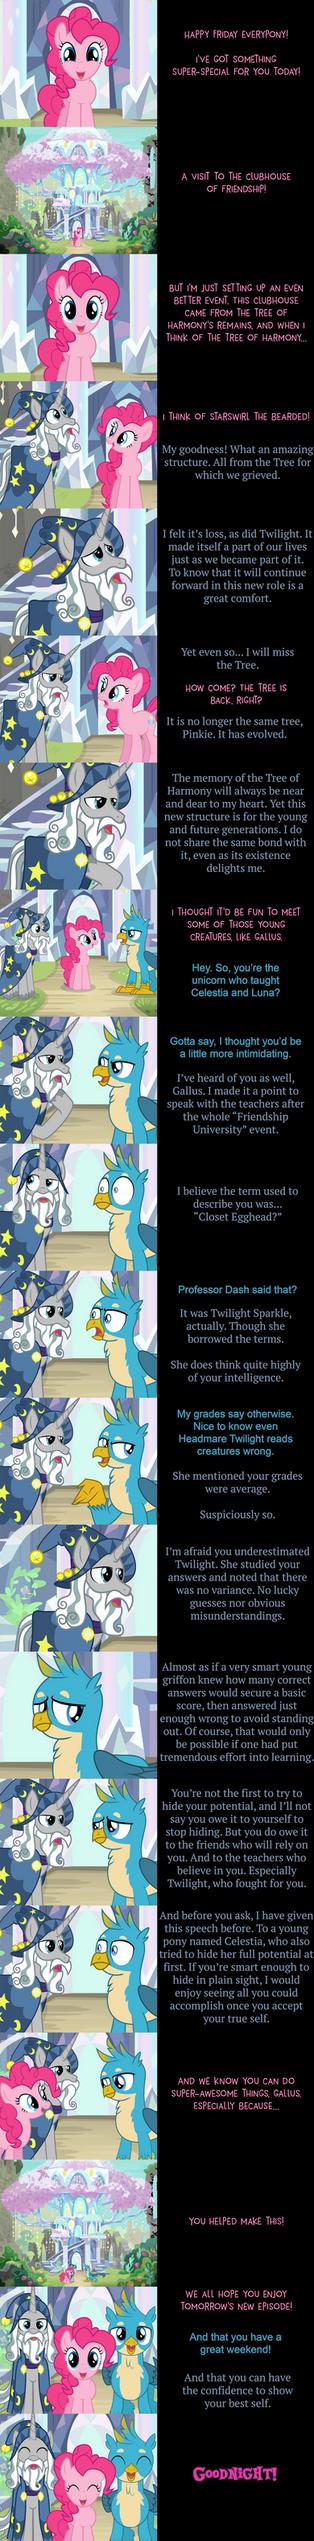 Pinkie Pie Says Goodnight: Plain Sight